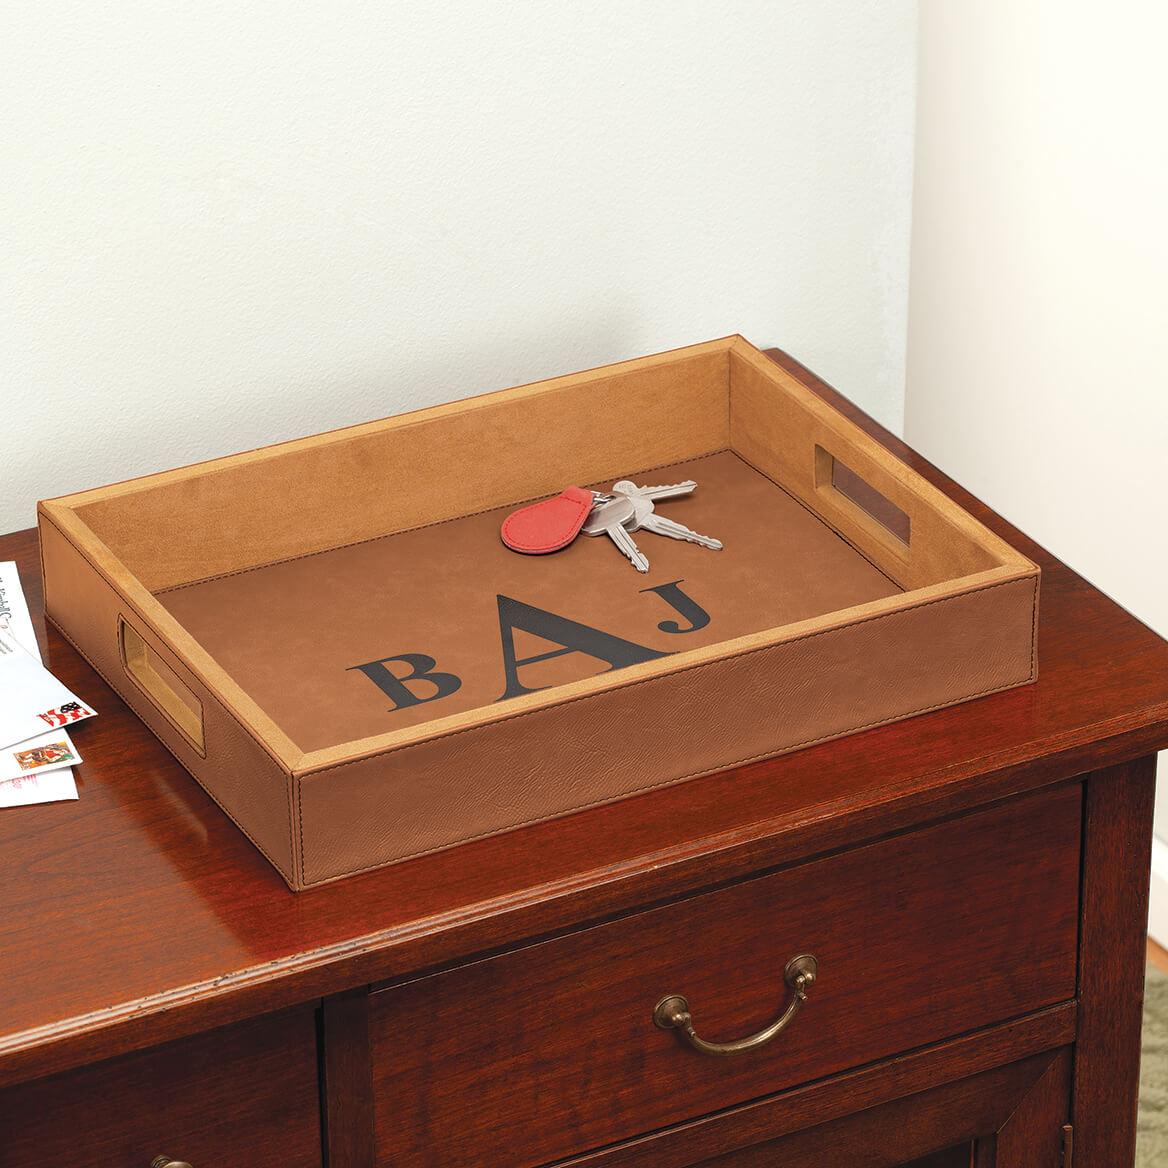 Personalized Leatherette Caramel Tray-370507